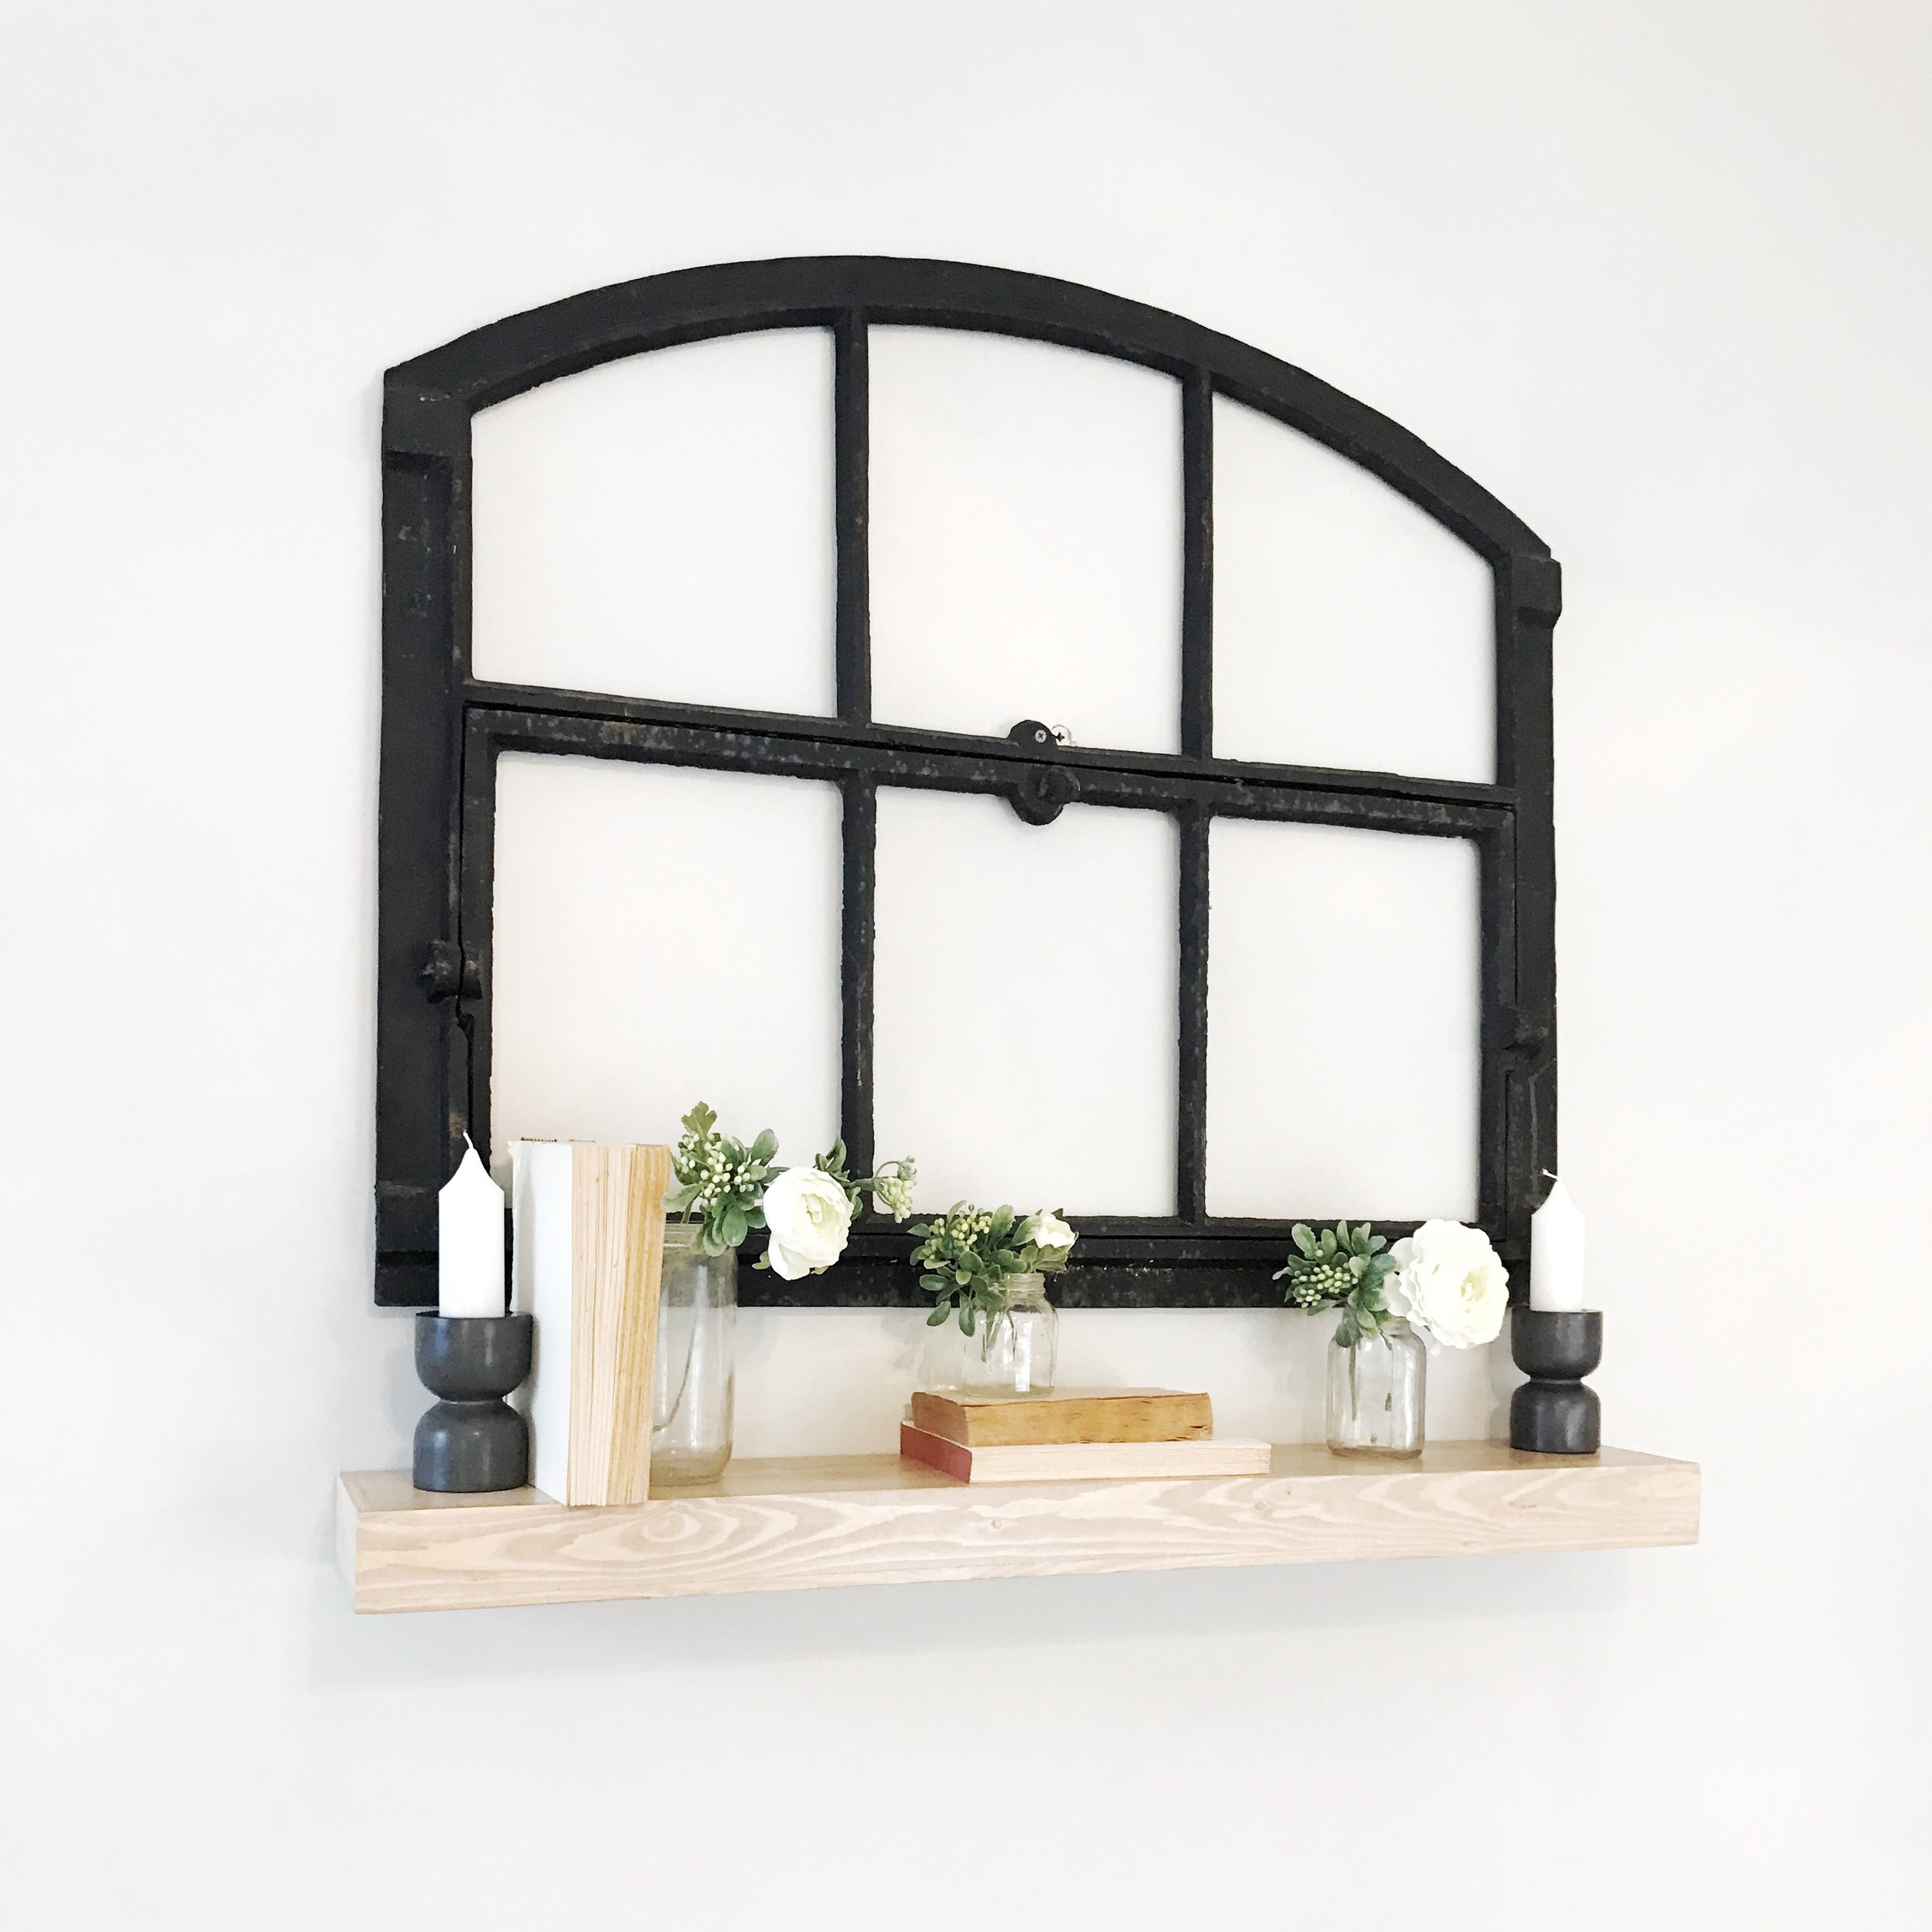 Farmhouse Style Living Room-Architectual Iron Arched window- Interior Design by Plum Pretty Decor and Design